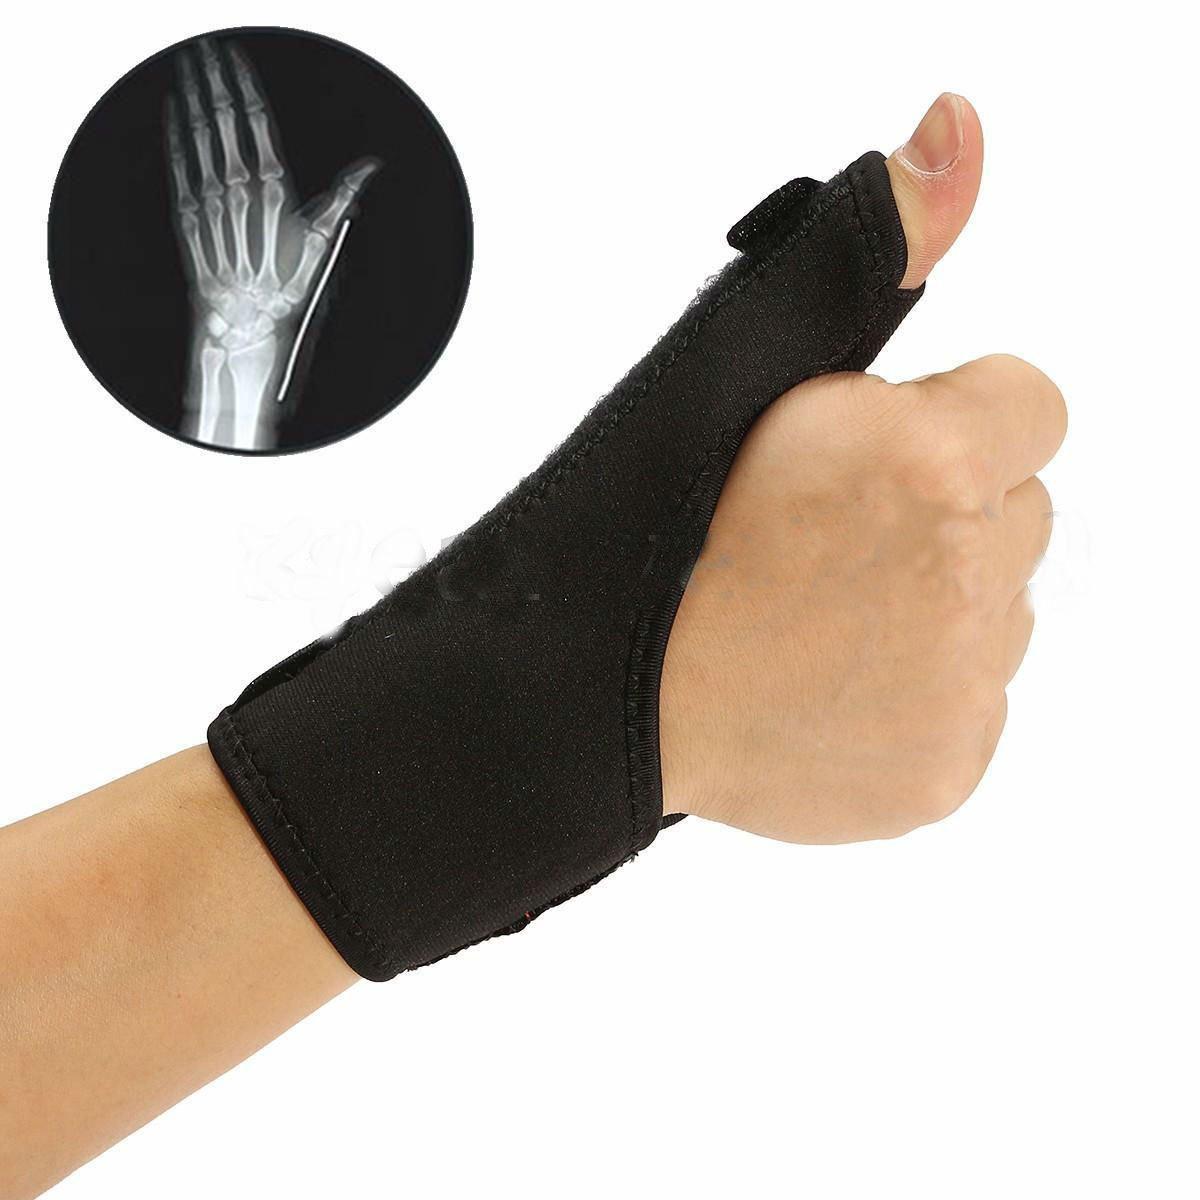 Medical Wrist Thumb Hand Spica Splint Support Brace Stabiliser Sprain Arthritis ddb